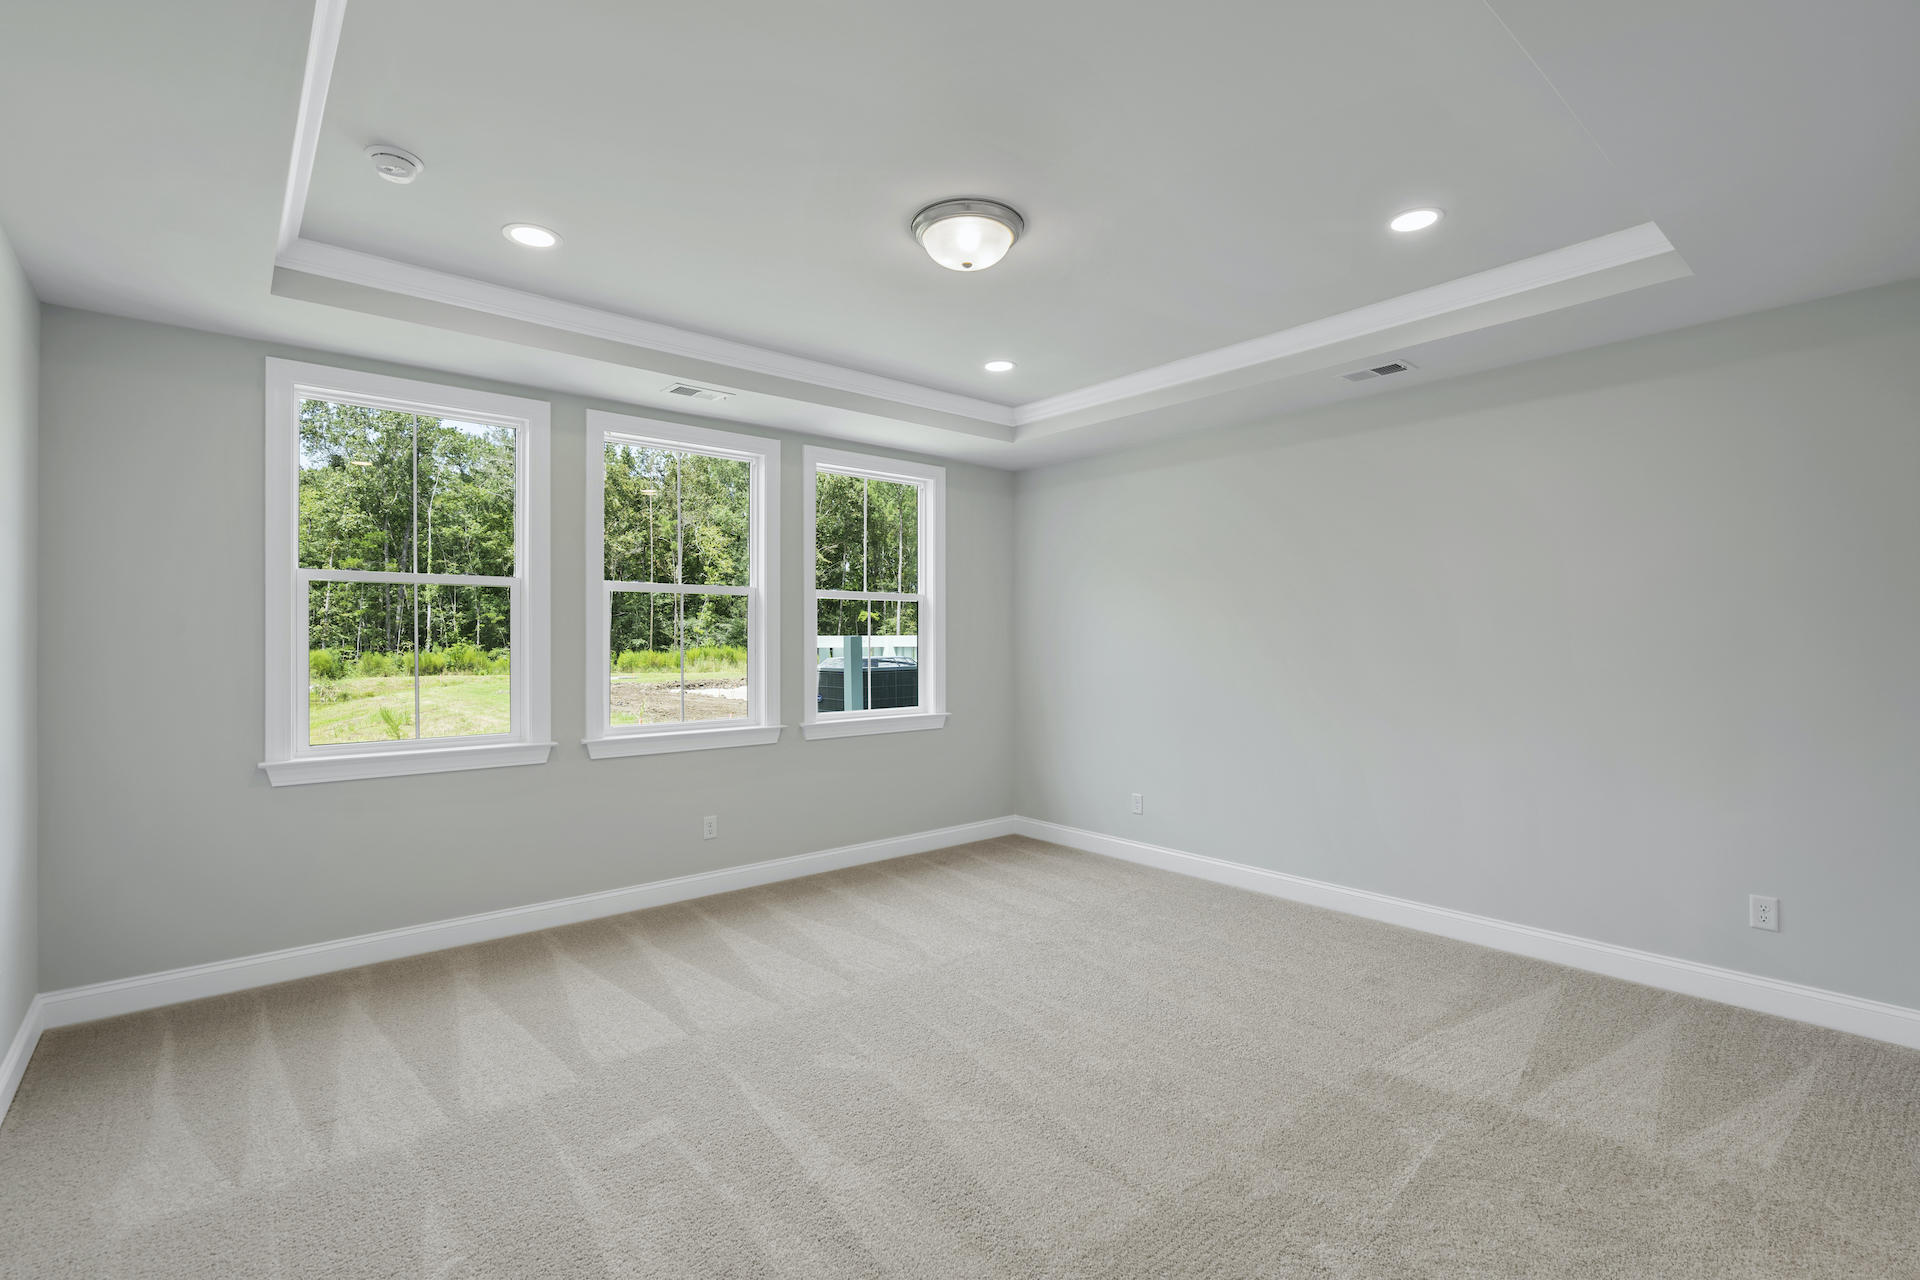 Drayton Oaks Homes For Sale - 105 Plowden Mill, Summerville, SC - 18